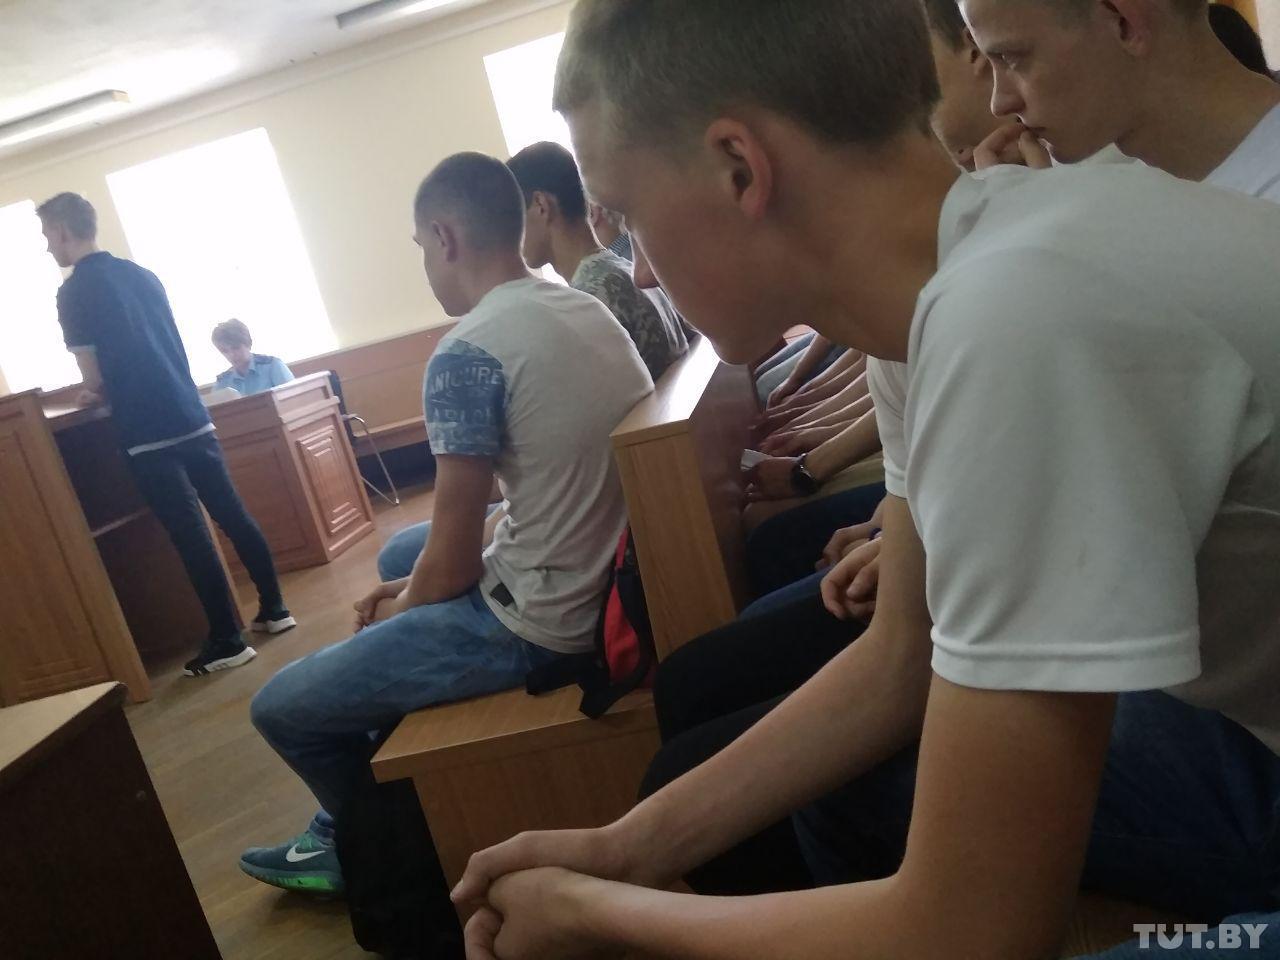 Фото с судебного заседания 5 июня 2019 года. Ольга Комягина, TUT.BY